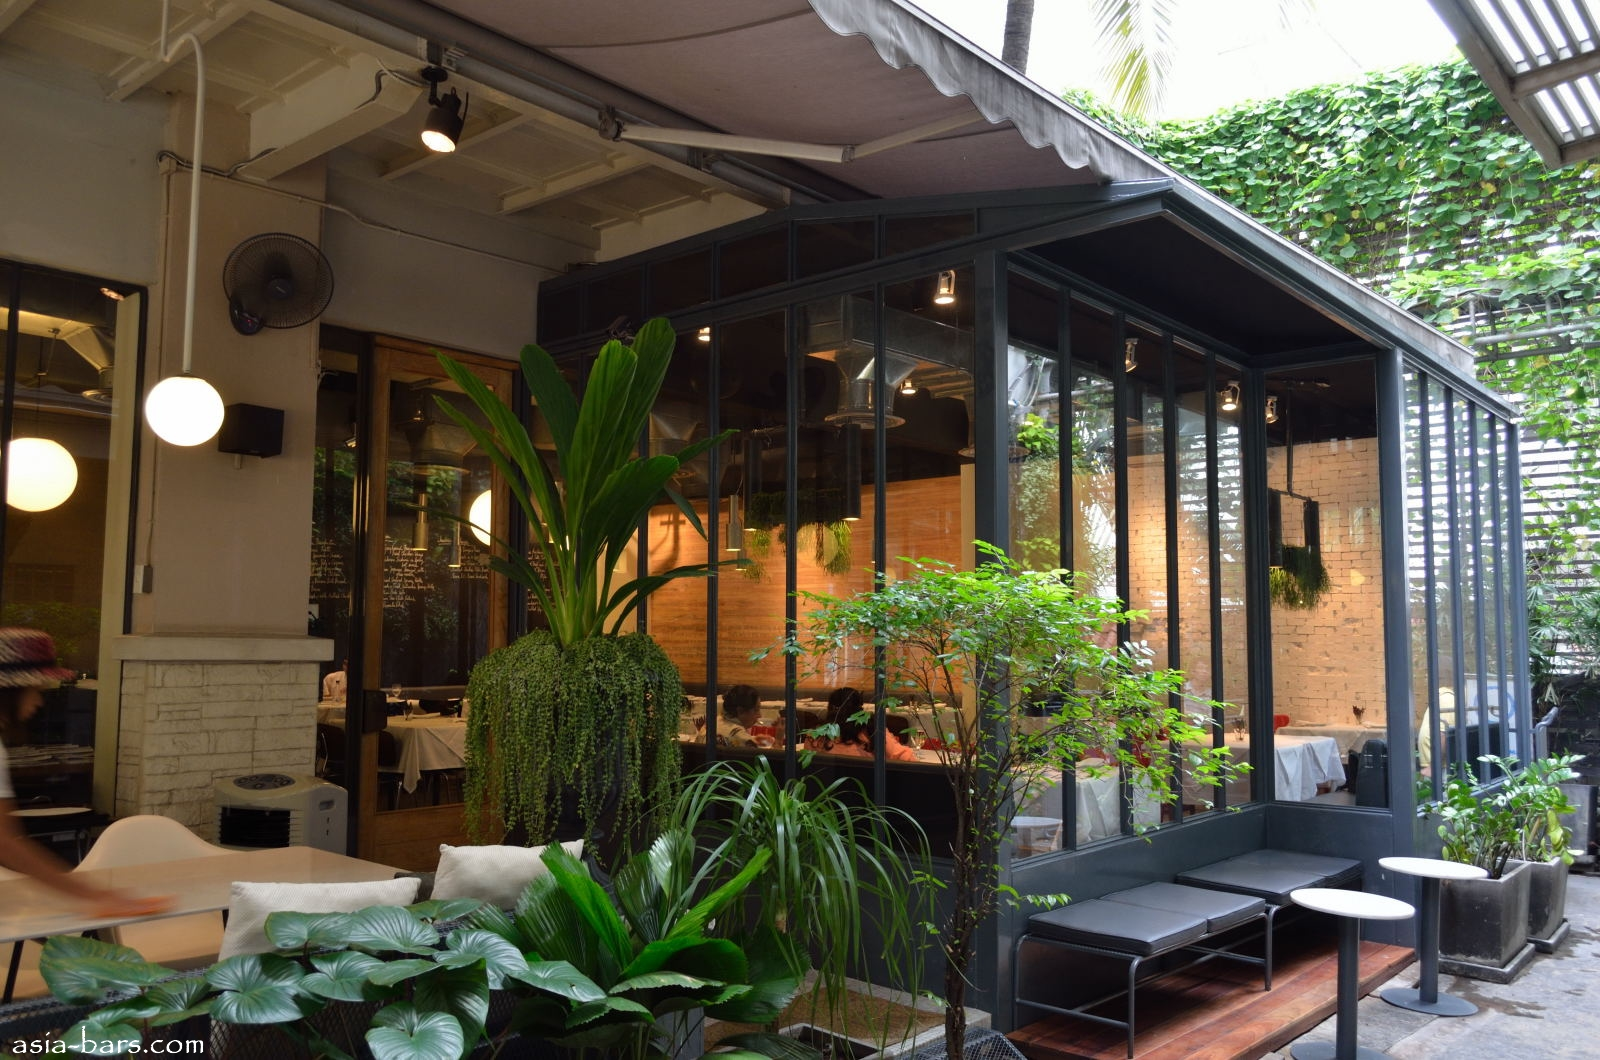 Greyhound Cafe Chic Urban Cafe Serving Innovative Thai